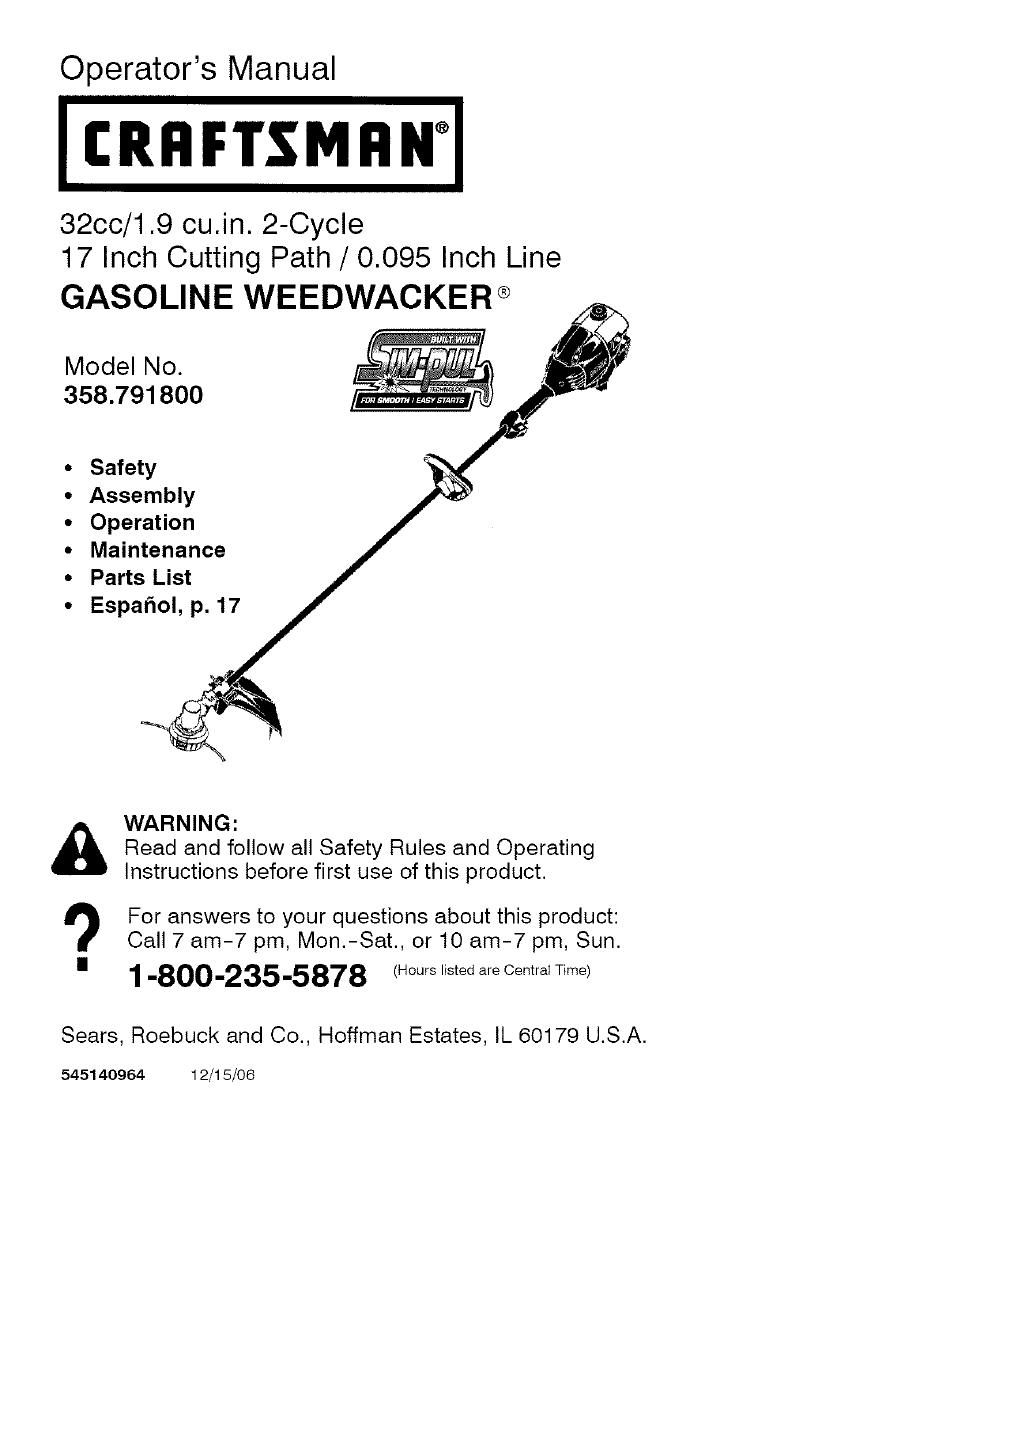 Craftsman weed Trimmer 25cc Manual